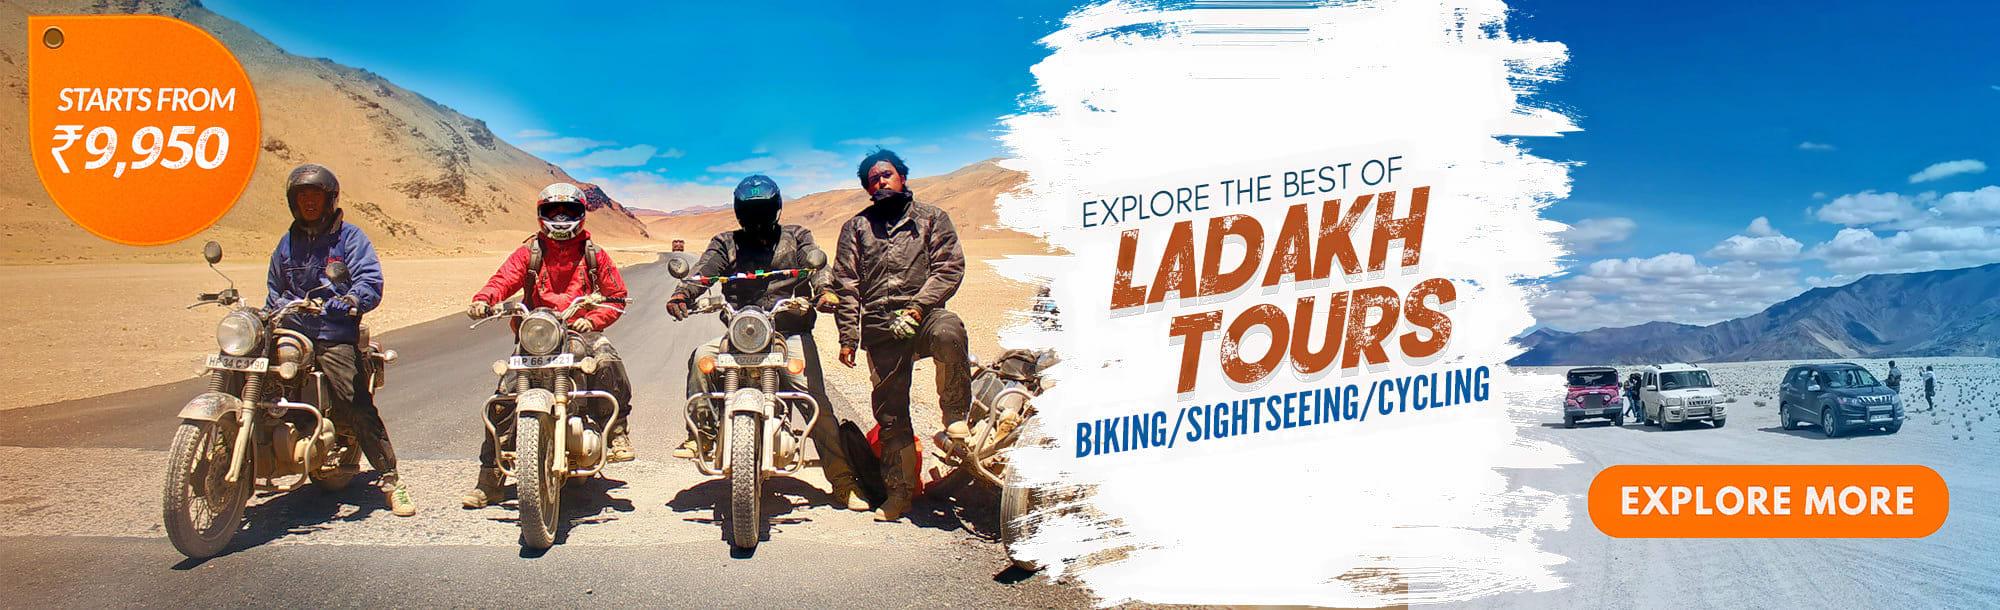 1551528610_ladakh_banner.png